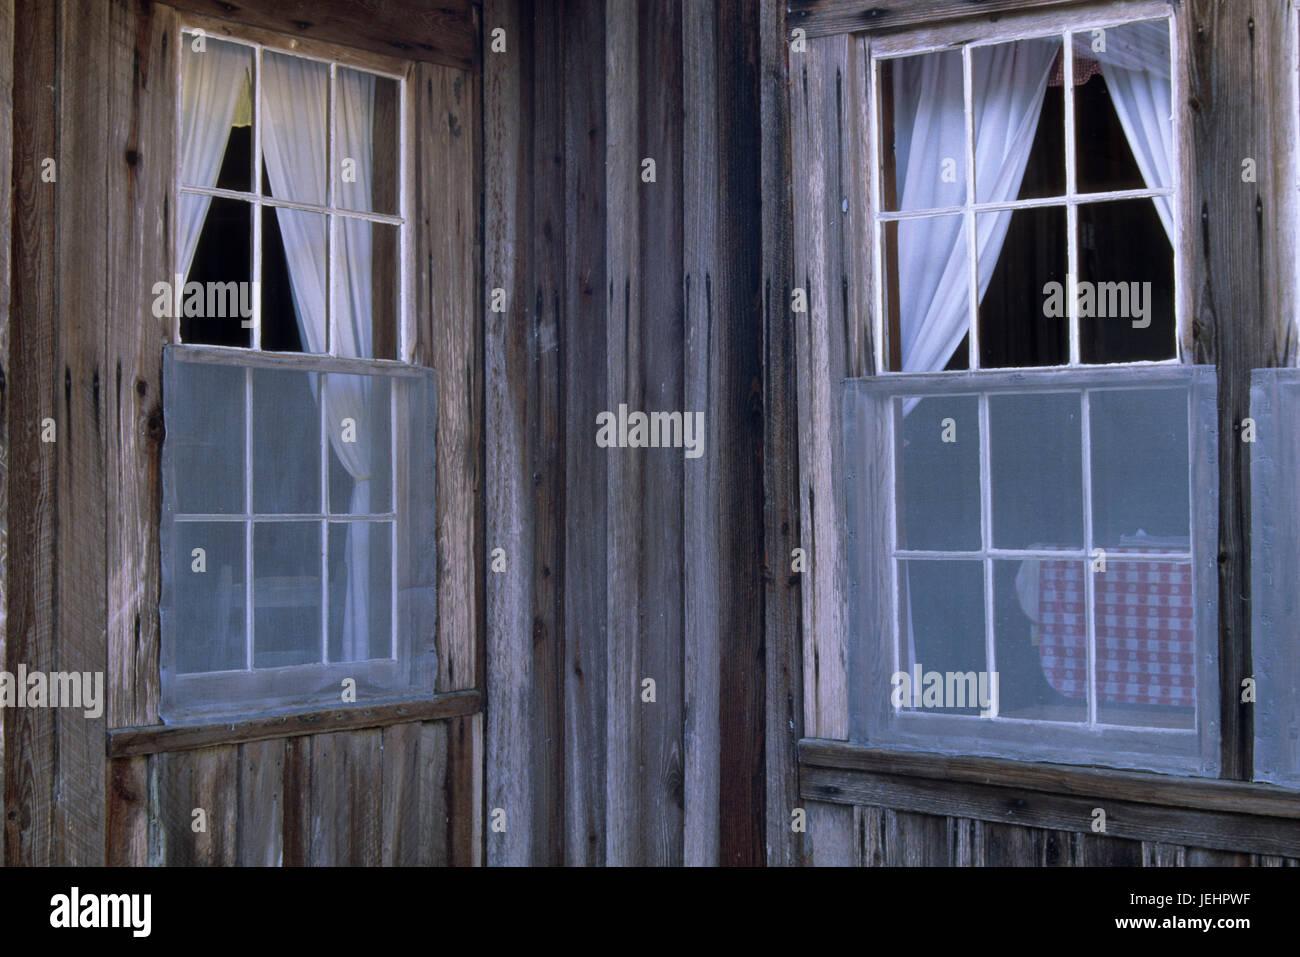 Windows at Chesser Island Homestead, Okefenokee National Wildlife Refuge, Georgia - Stock Image